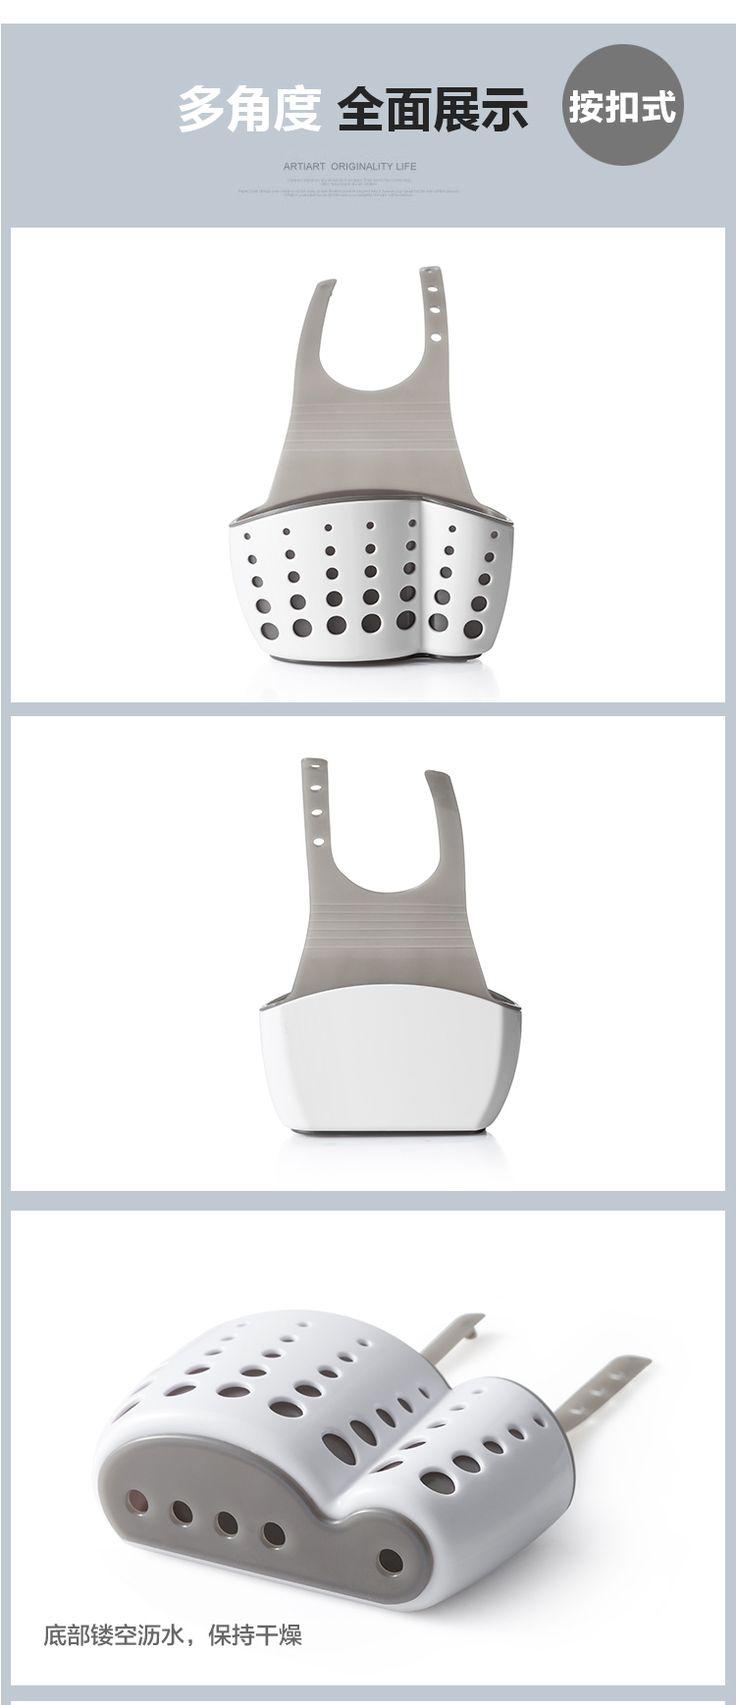 W creative in the kitchen sink drain basket shelf storage plastic faucet sink dishwashing sponge storage basket - Shop @ ezbuy Singapore